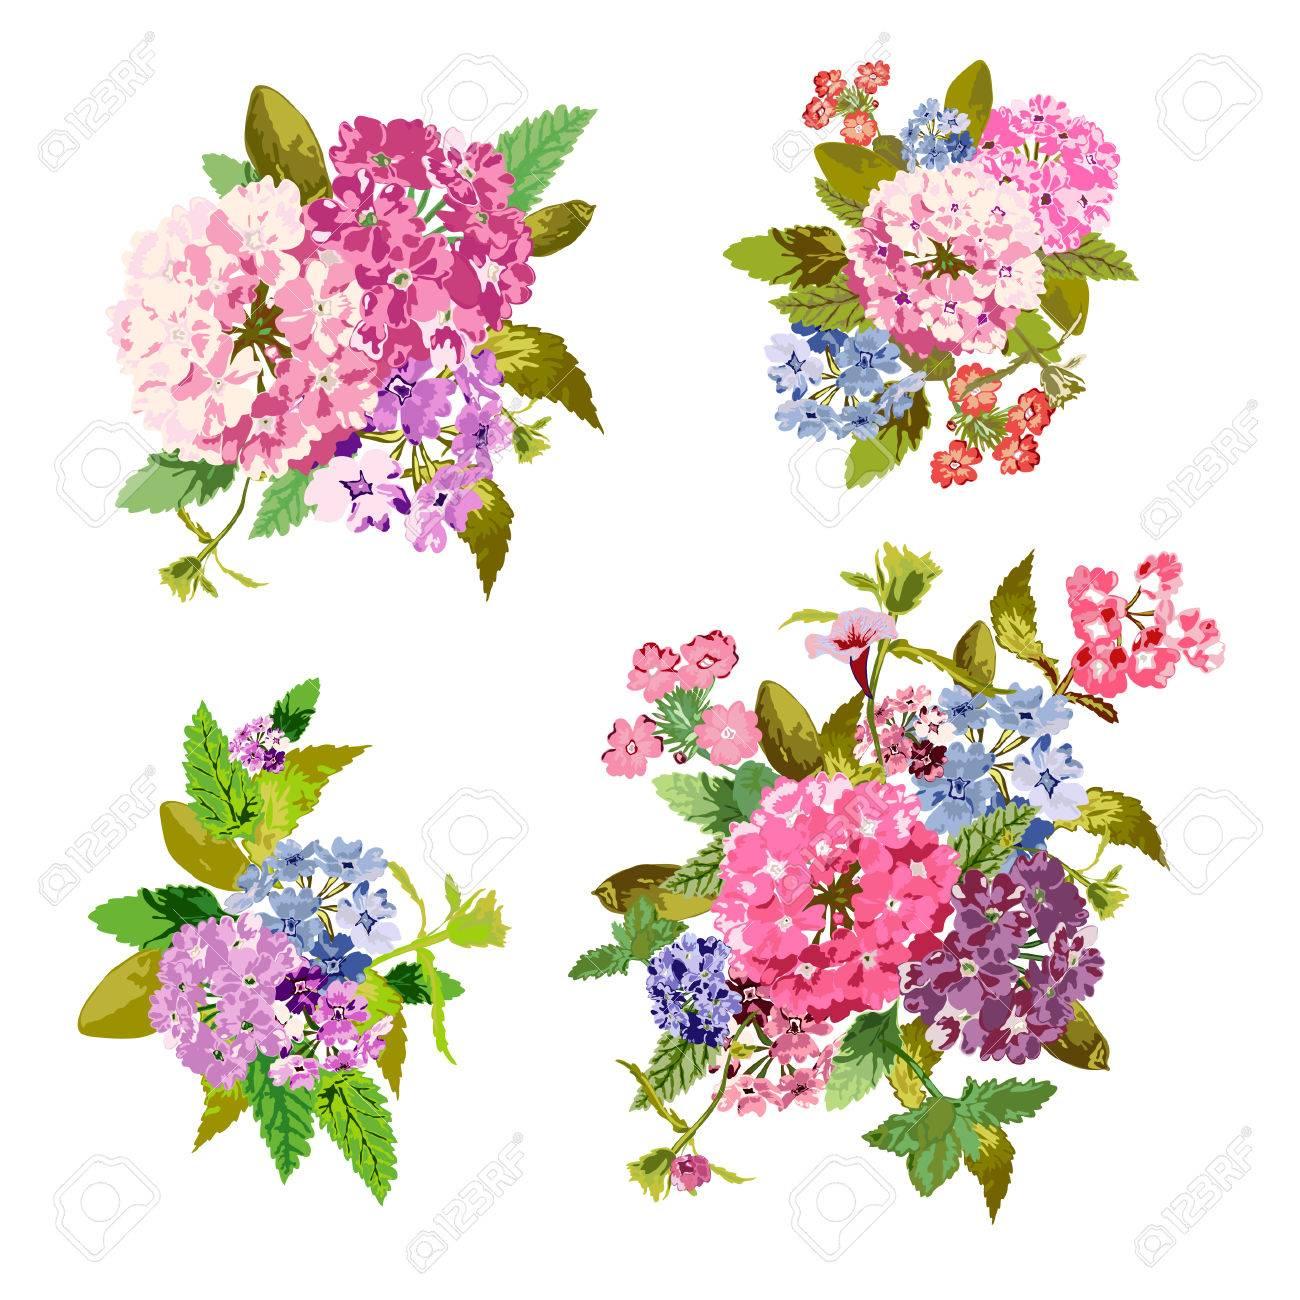 Elegant Bouquets With Flowers, Design Elements. Floral Compositions ...